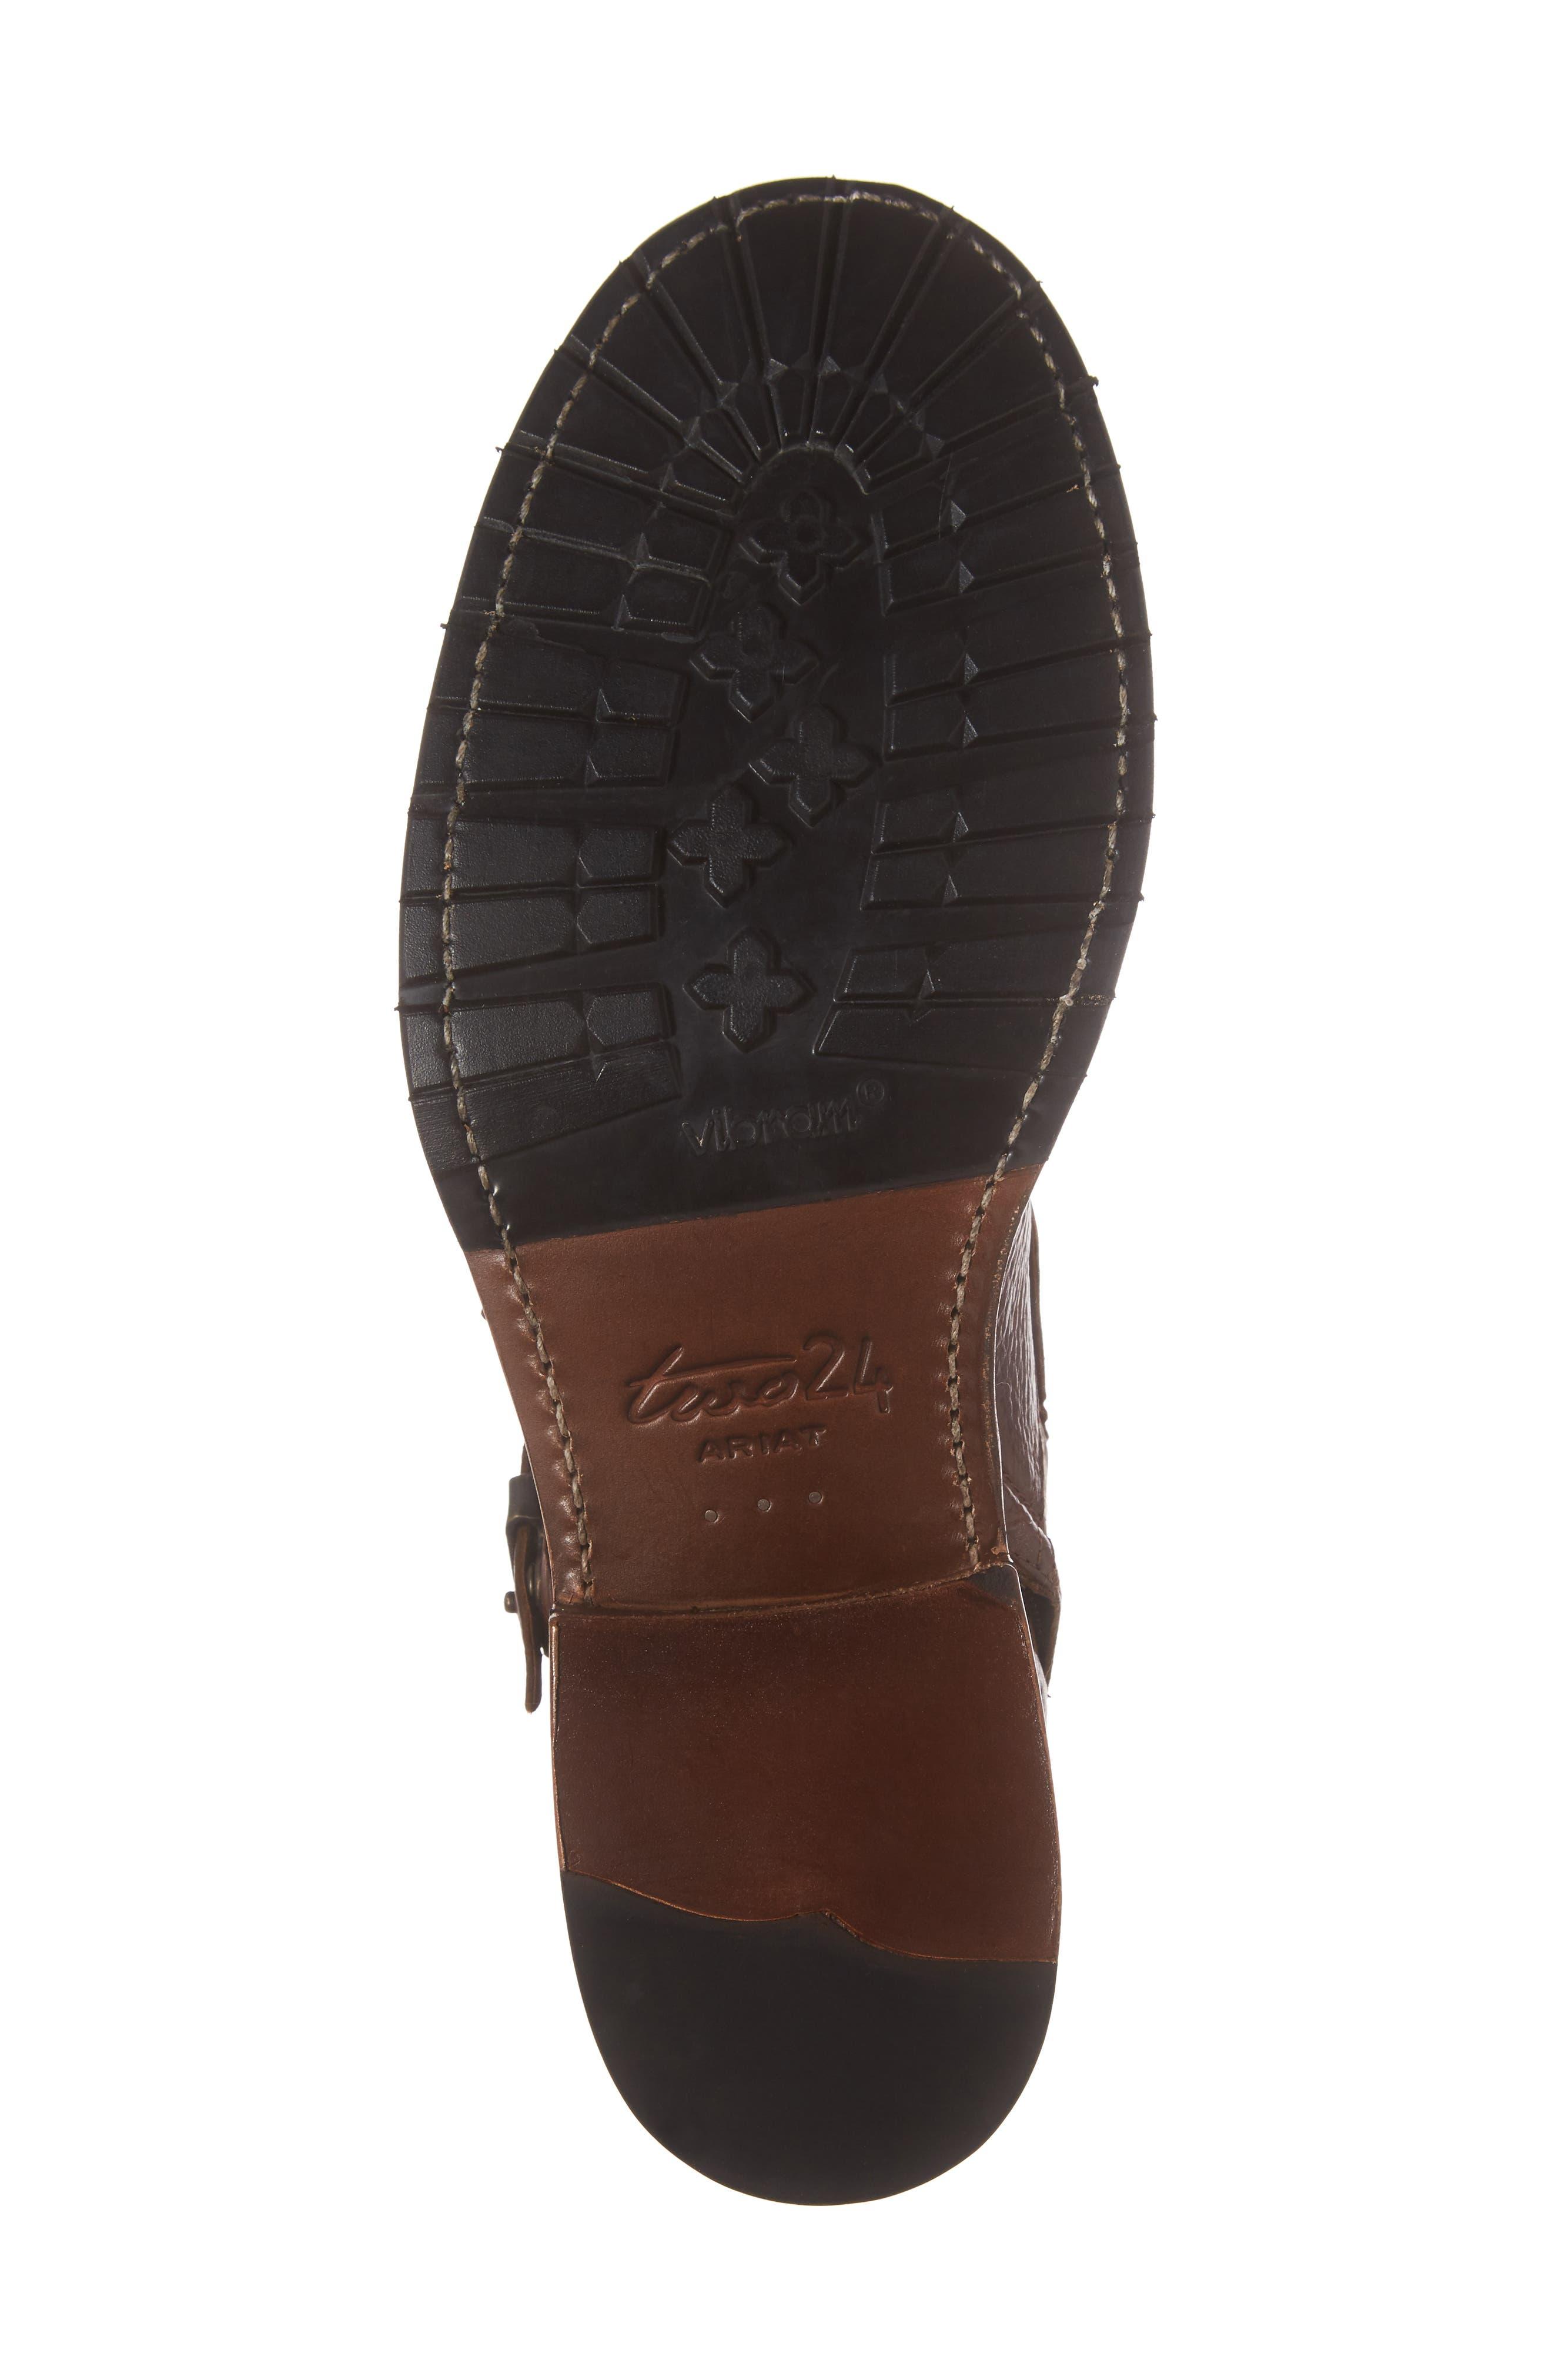 Montclair Zip Boot,                             Alternate thumbnail 6, color,                             Brown Leather